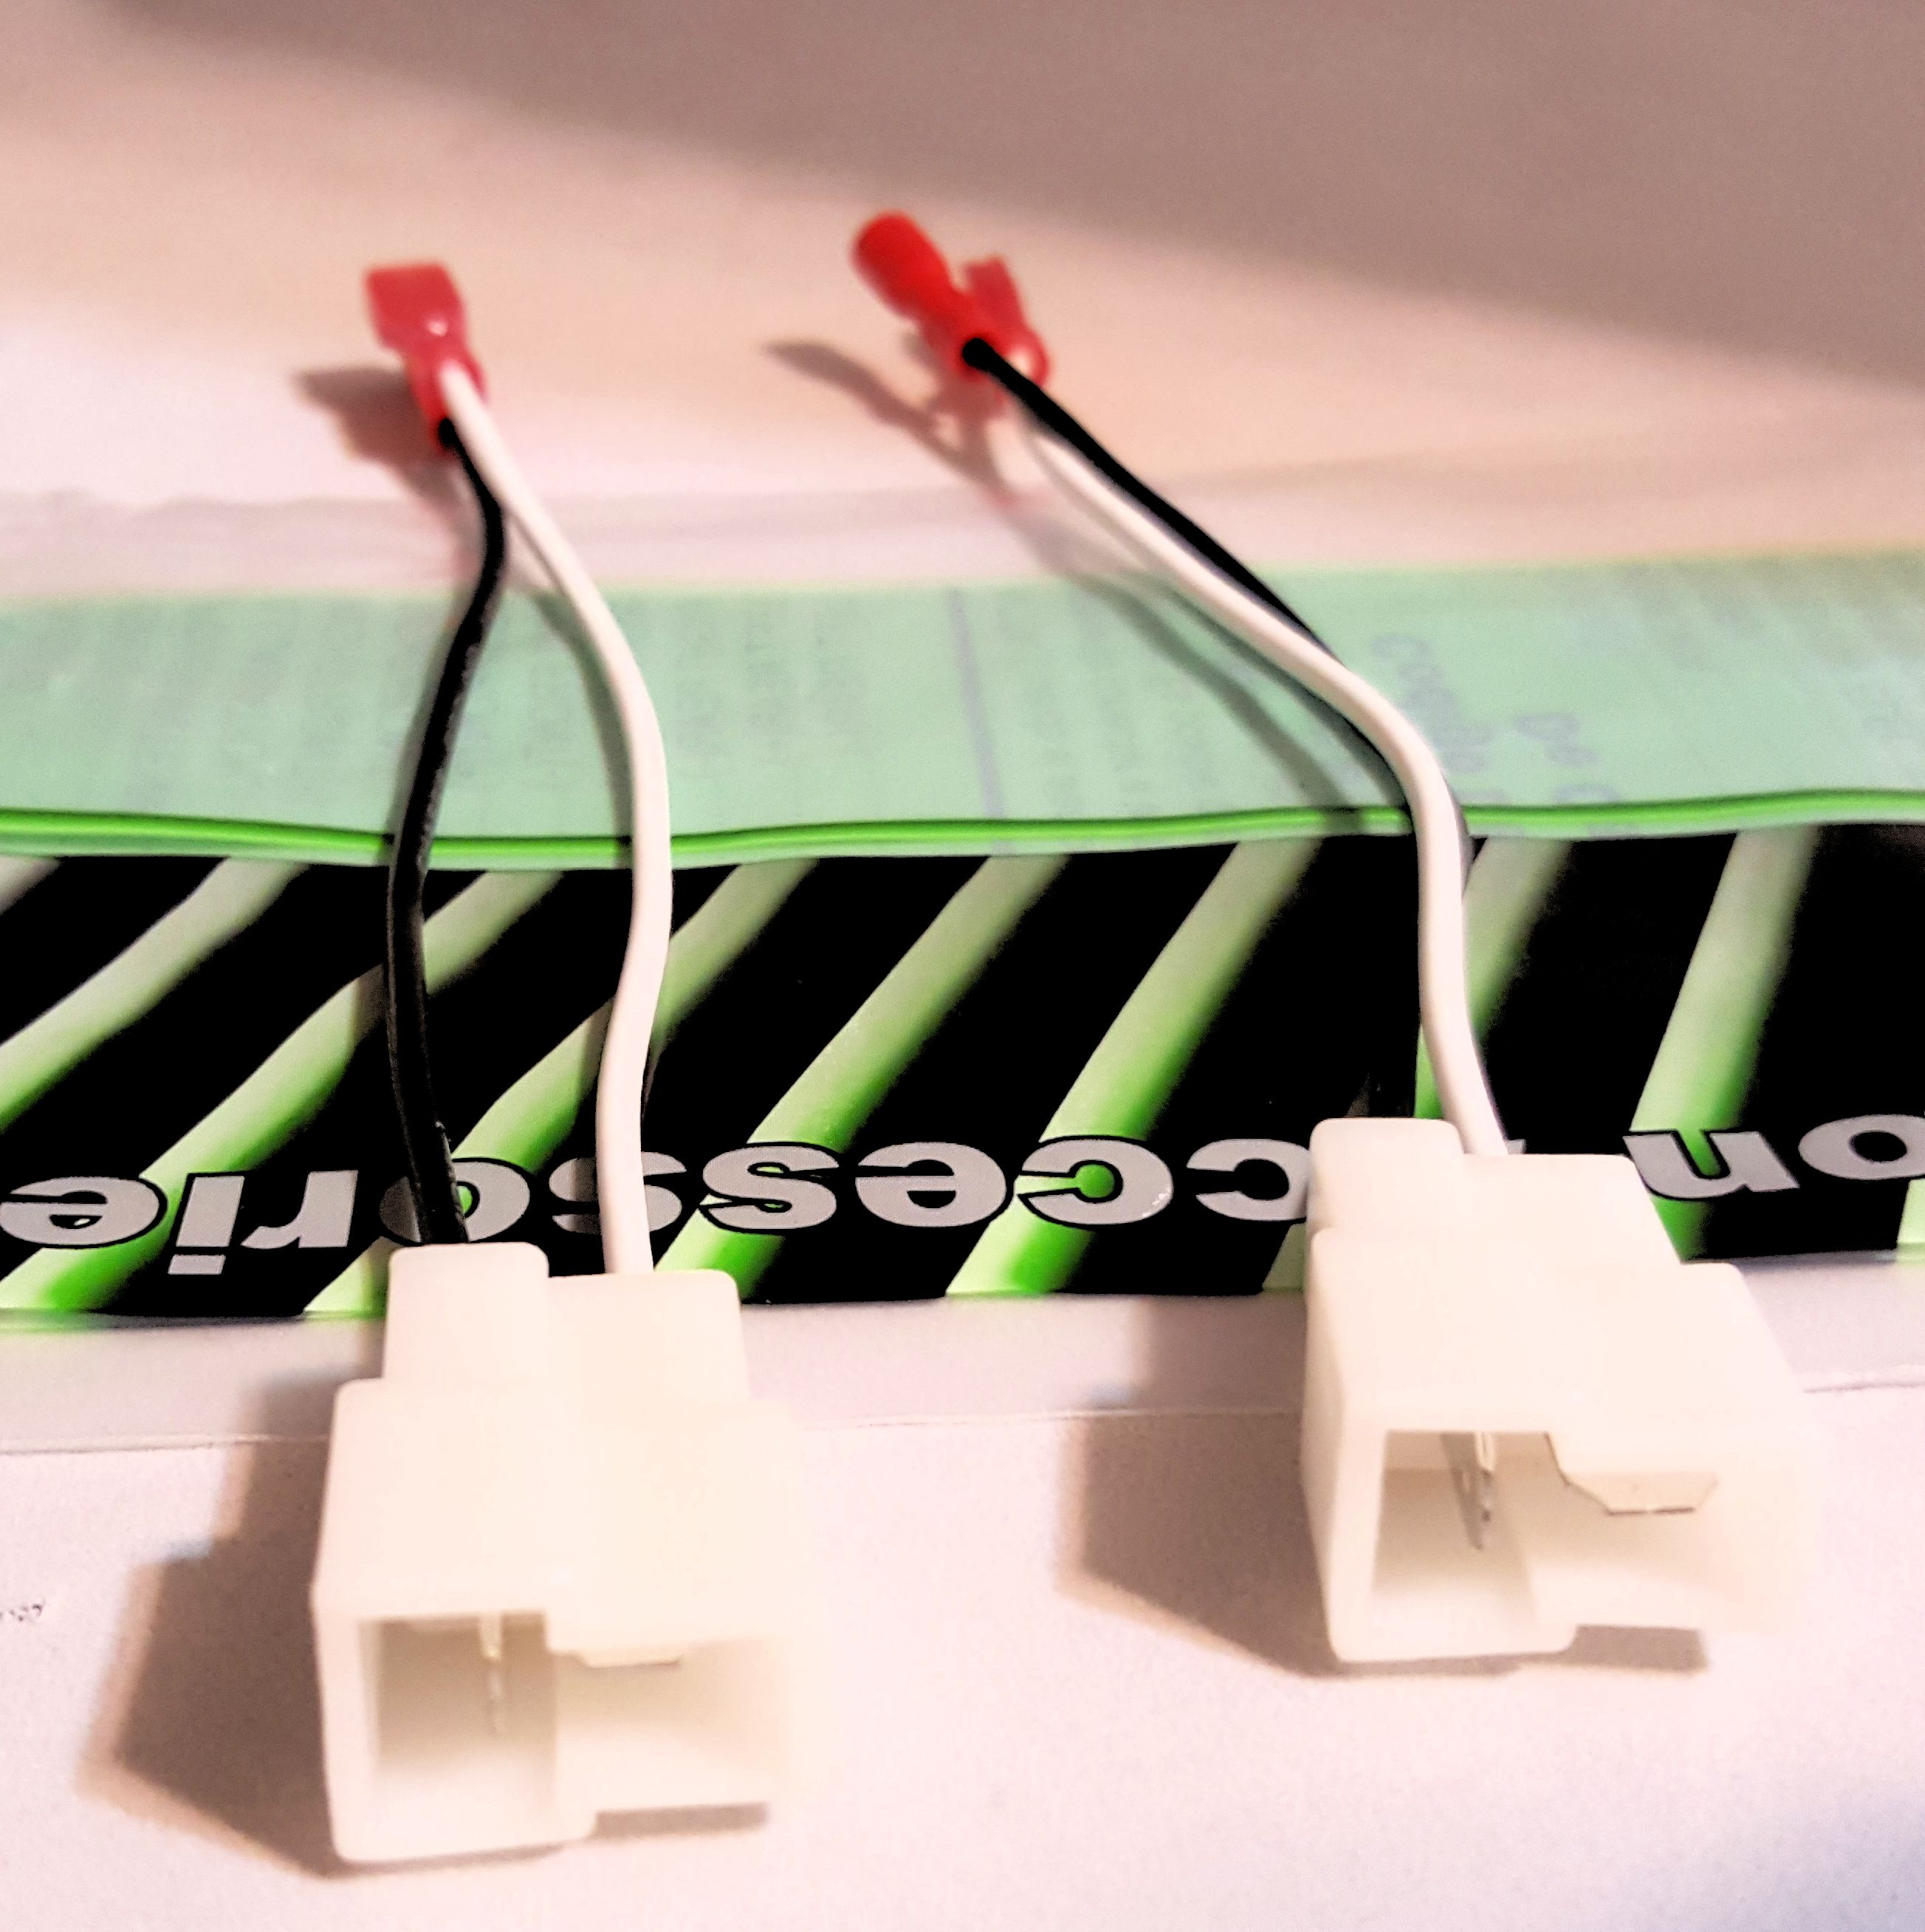 2004-2006 suzuki verona speaker wire harness adapter connector  uneeksupply